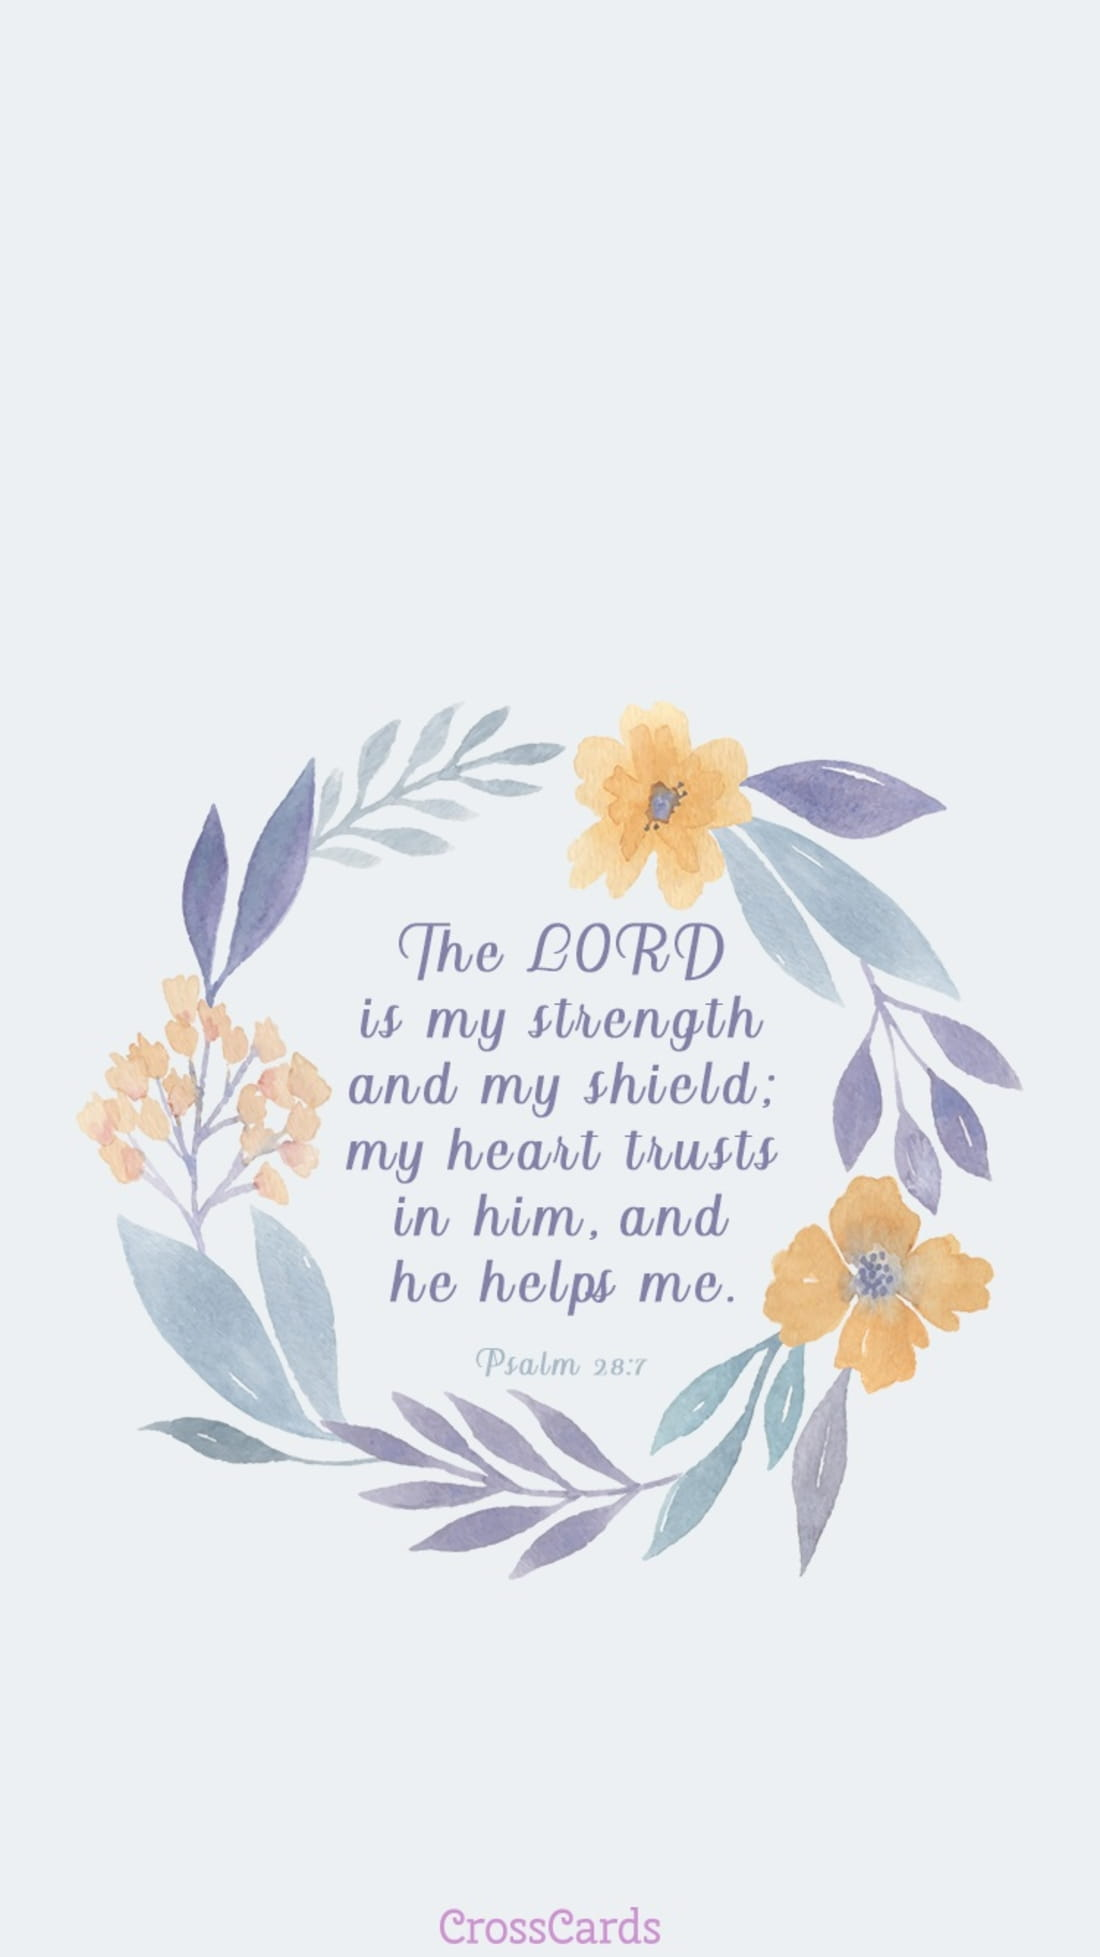 Psalm 28:7 mobile phone wallpaper